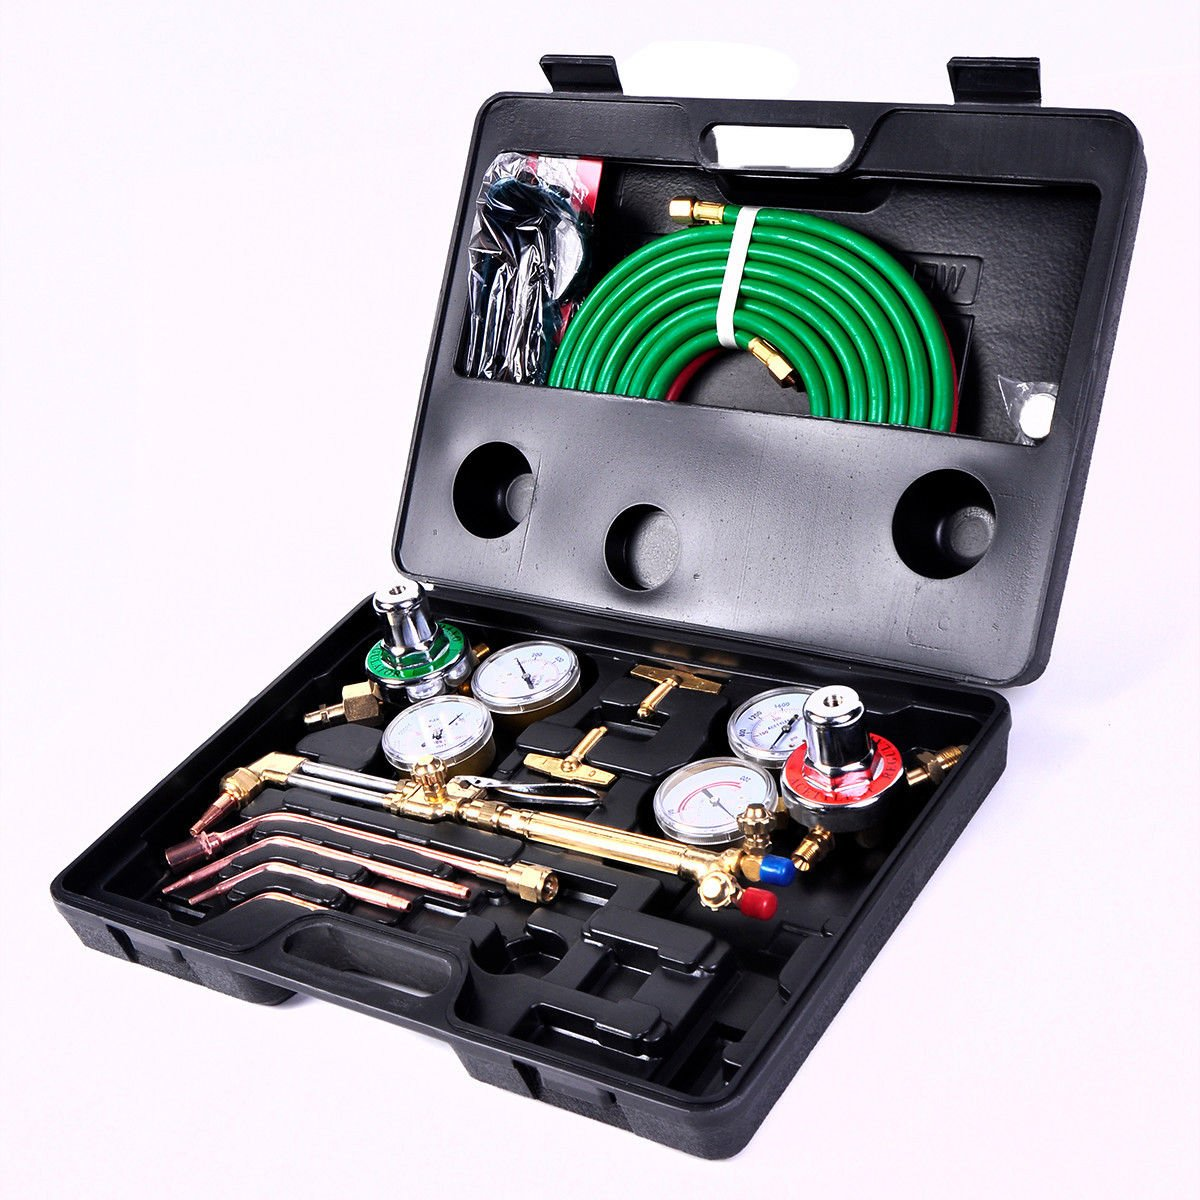 Fits VICTOR W/Hose Gas Welding Cutting Kit Oxy Acetylene Oxygen Torch Brazing DirectWholesaler16